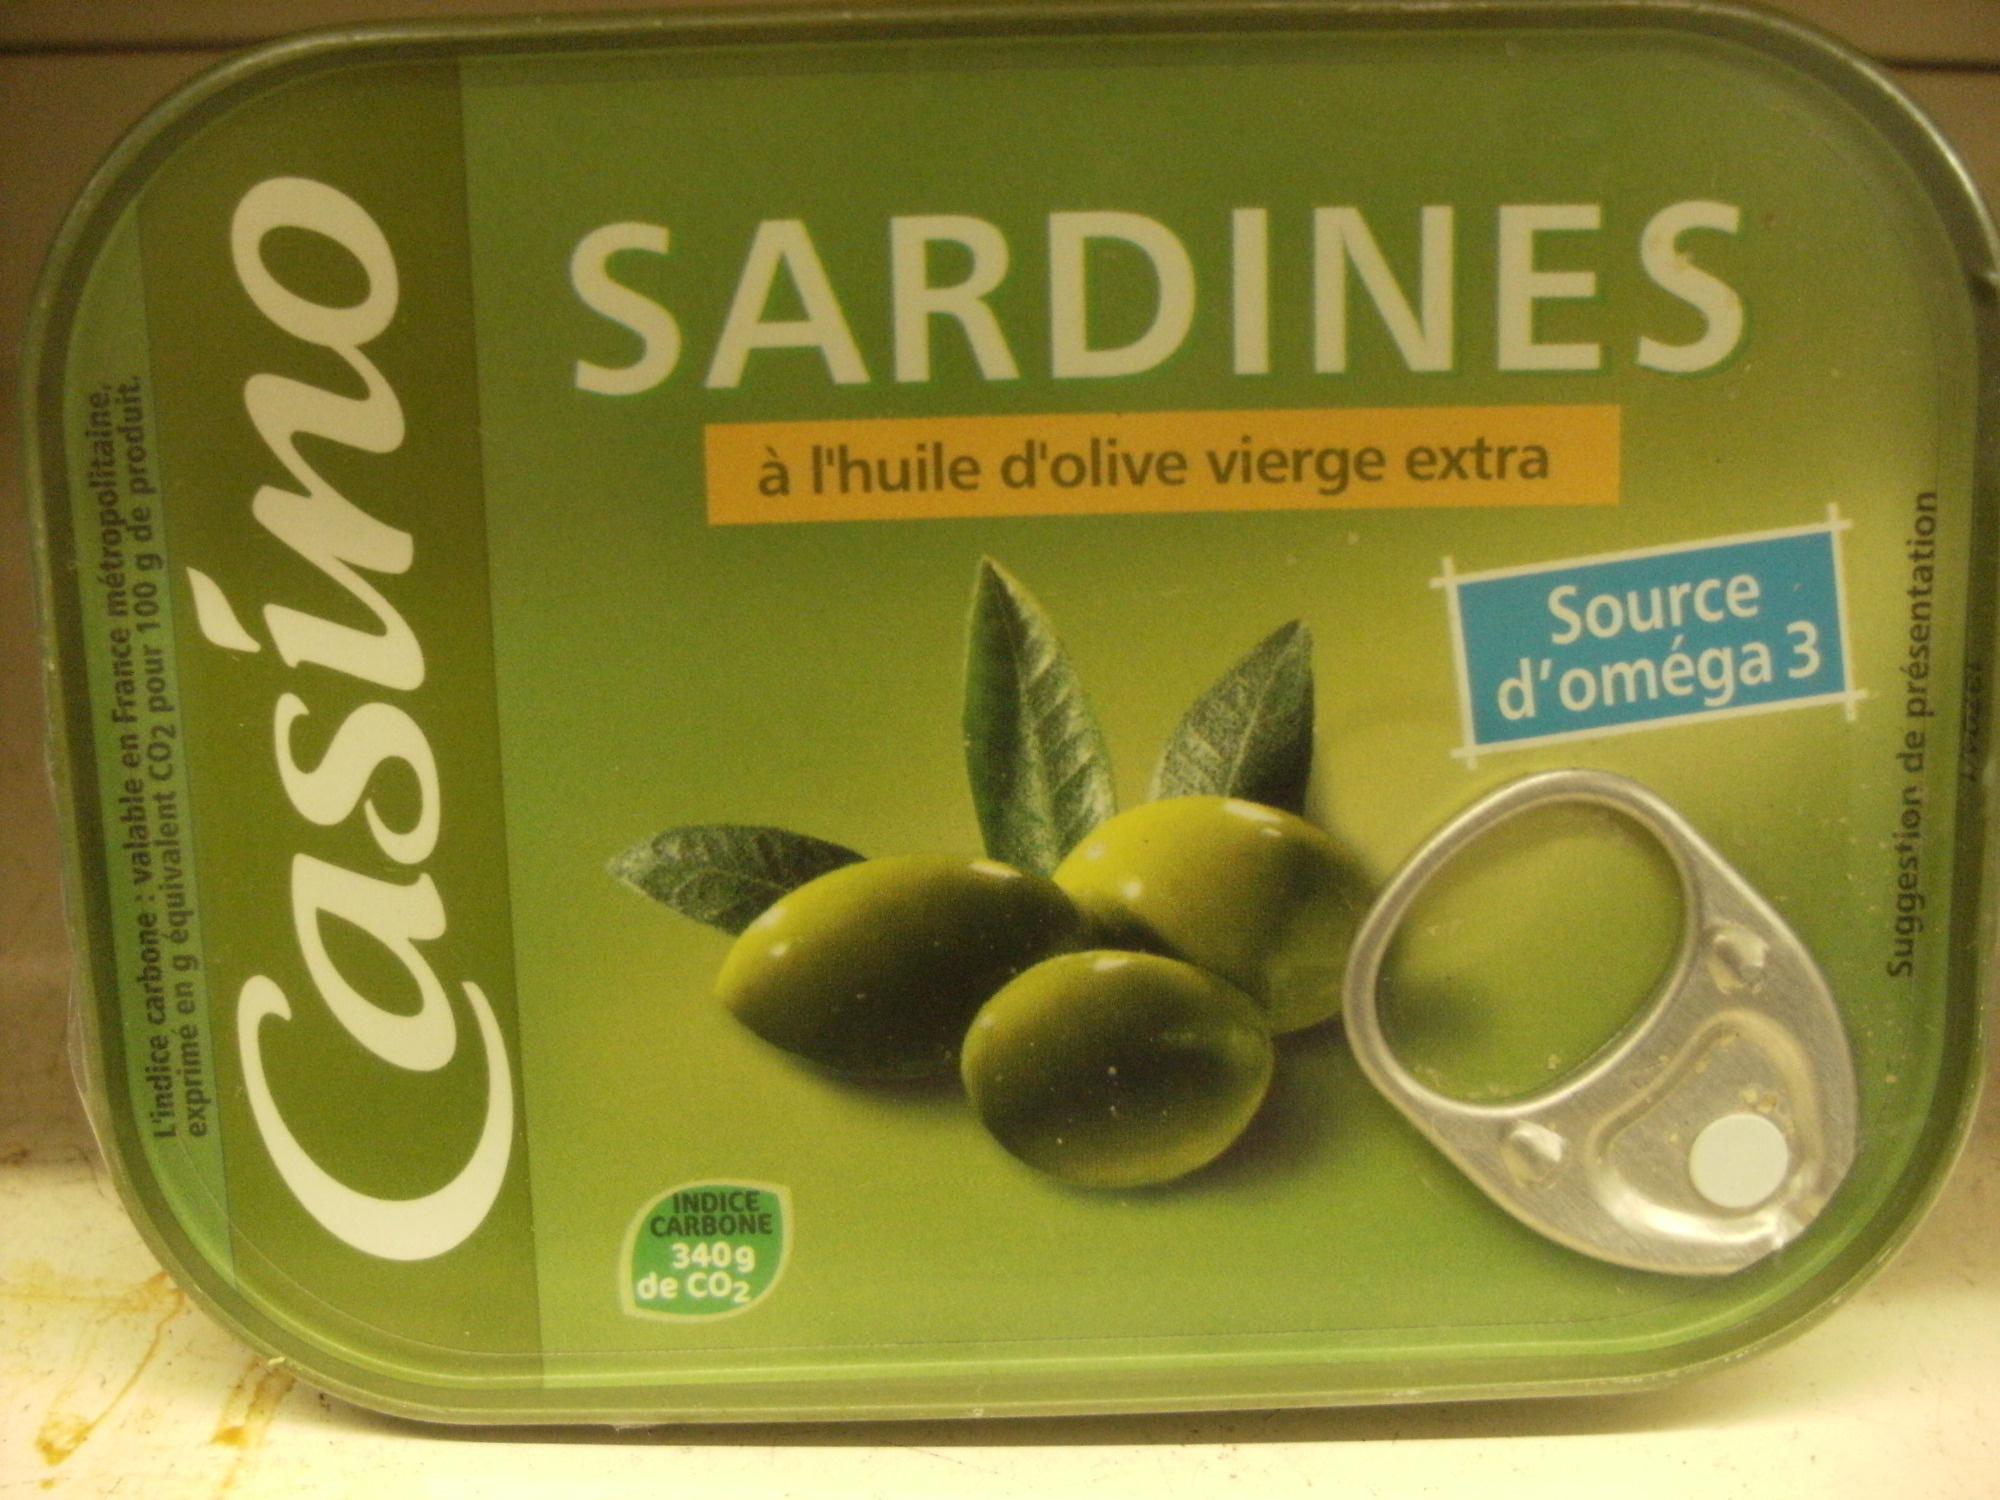 Sardines Huile d'Olive Riche en Omega 3 - Produit